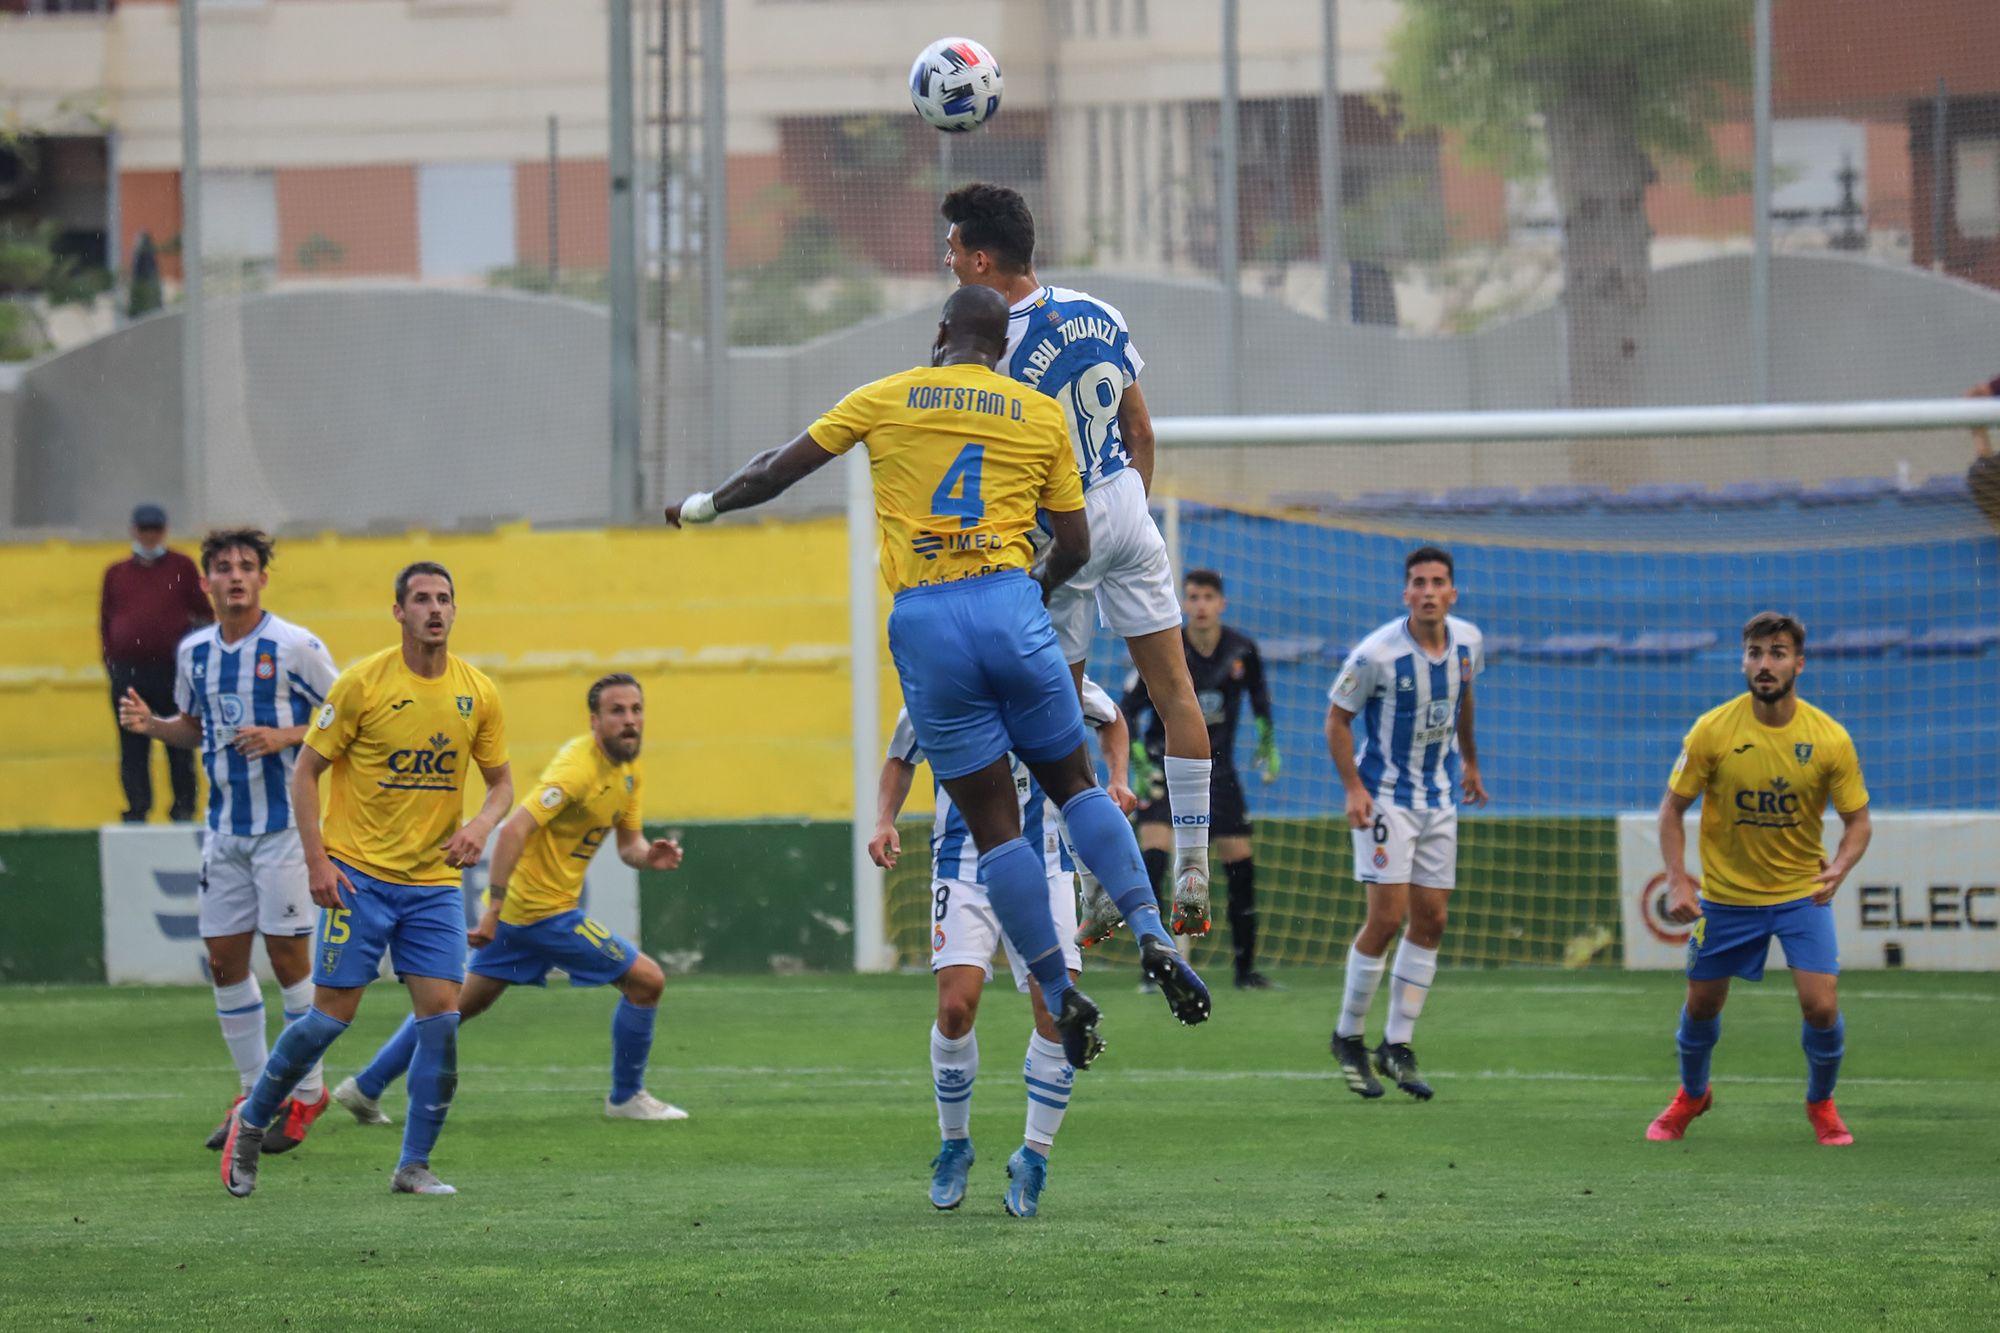 Orihuela CF 2 - 1 Espanyol B